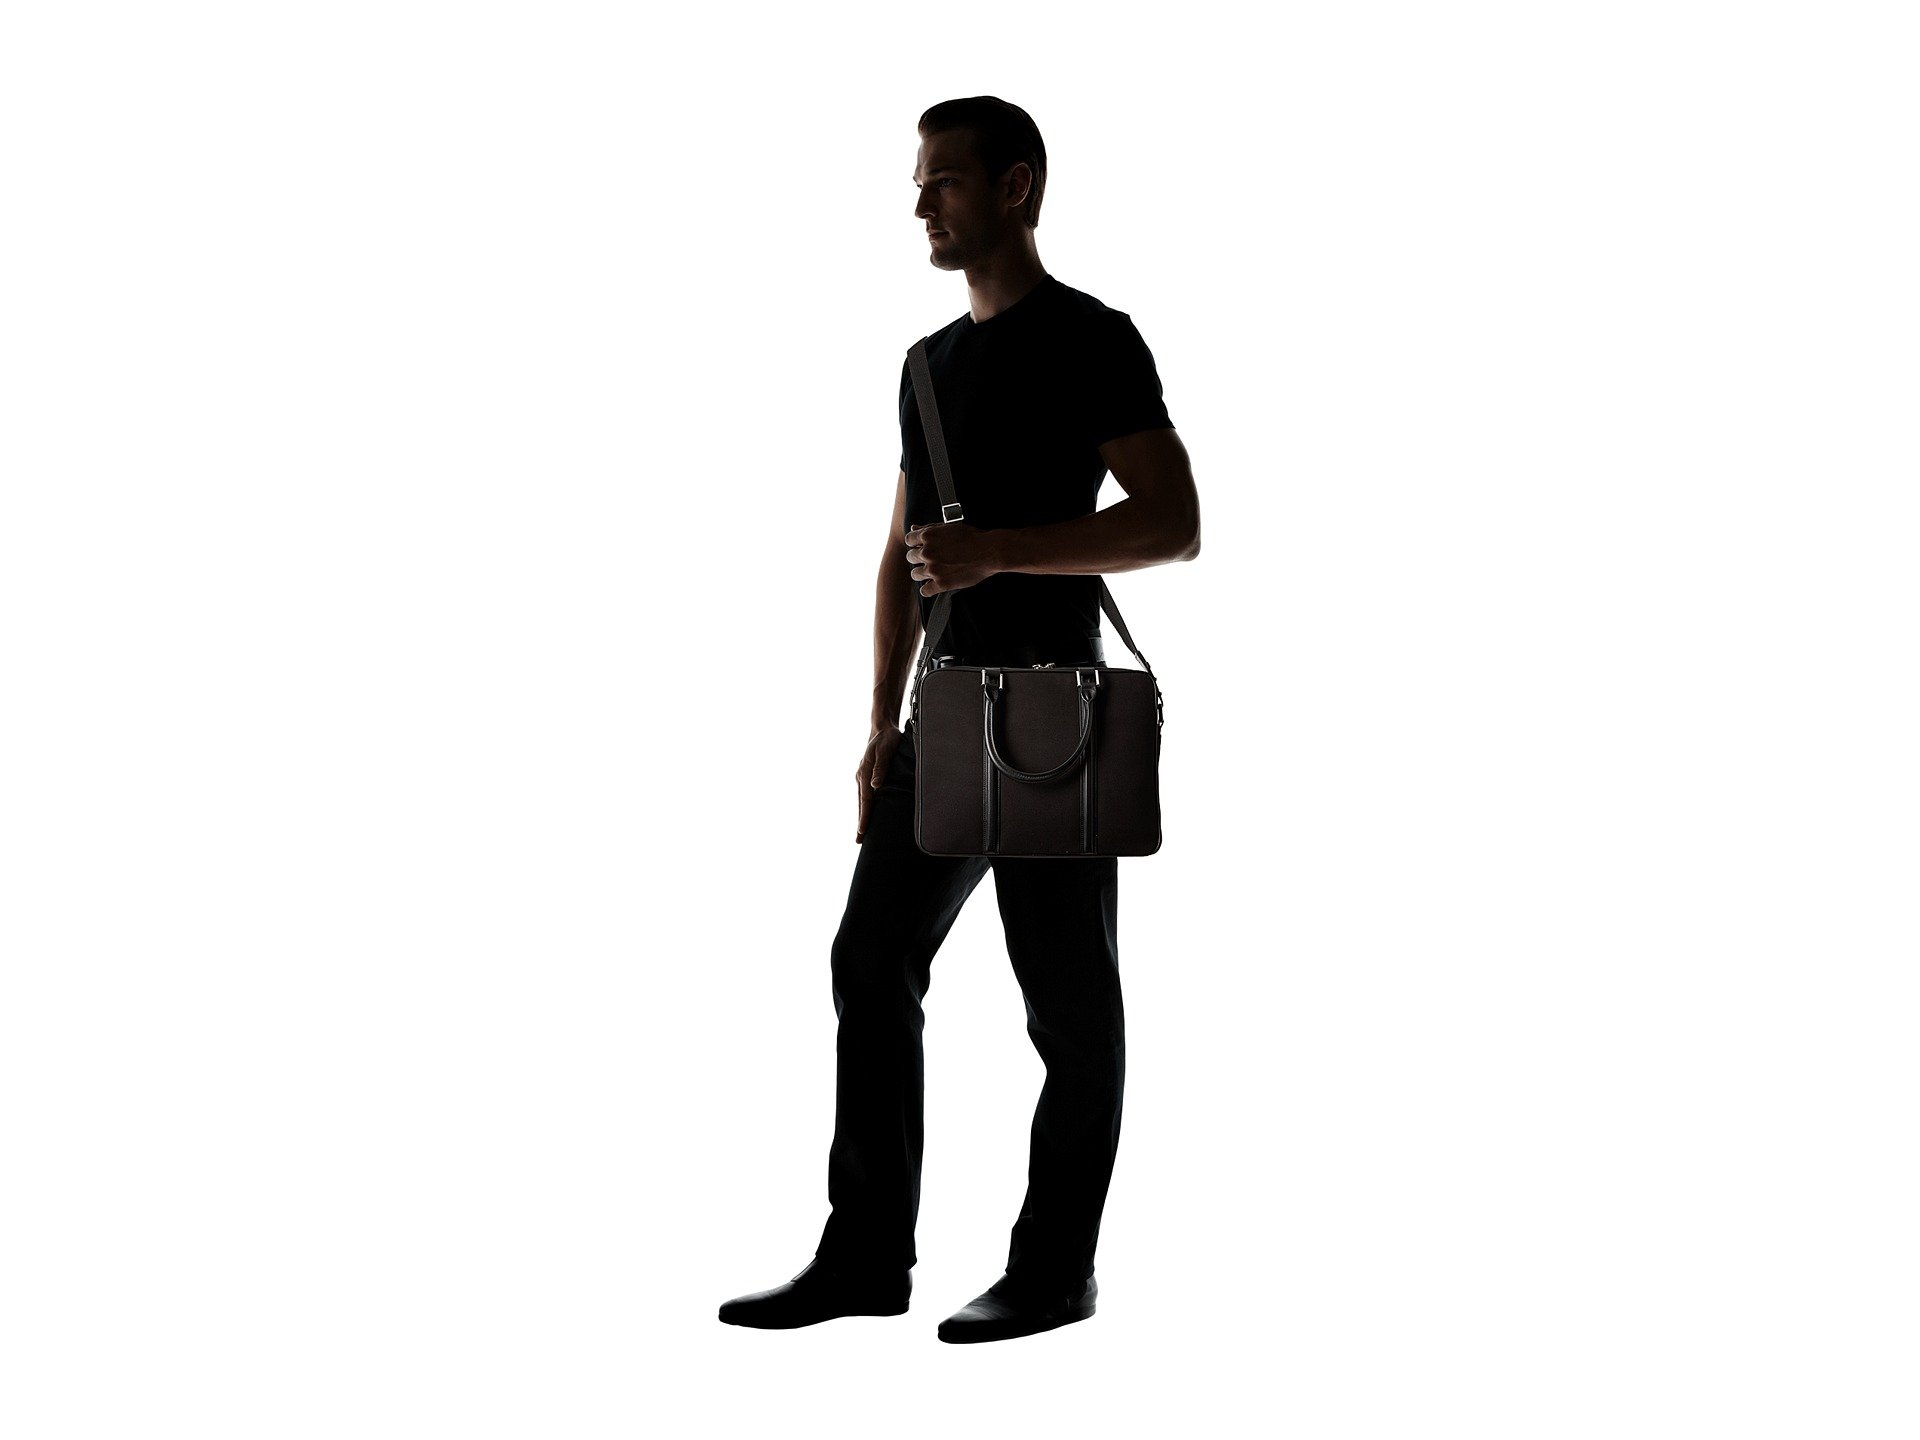 Want Black Les Haneda Slim 15 Computer Essentiels black Bag qaUwCxq